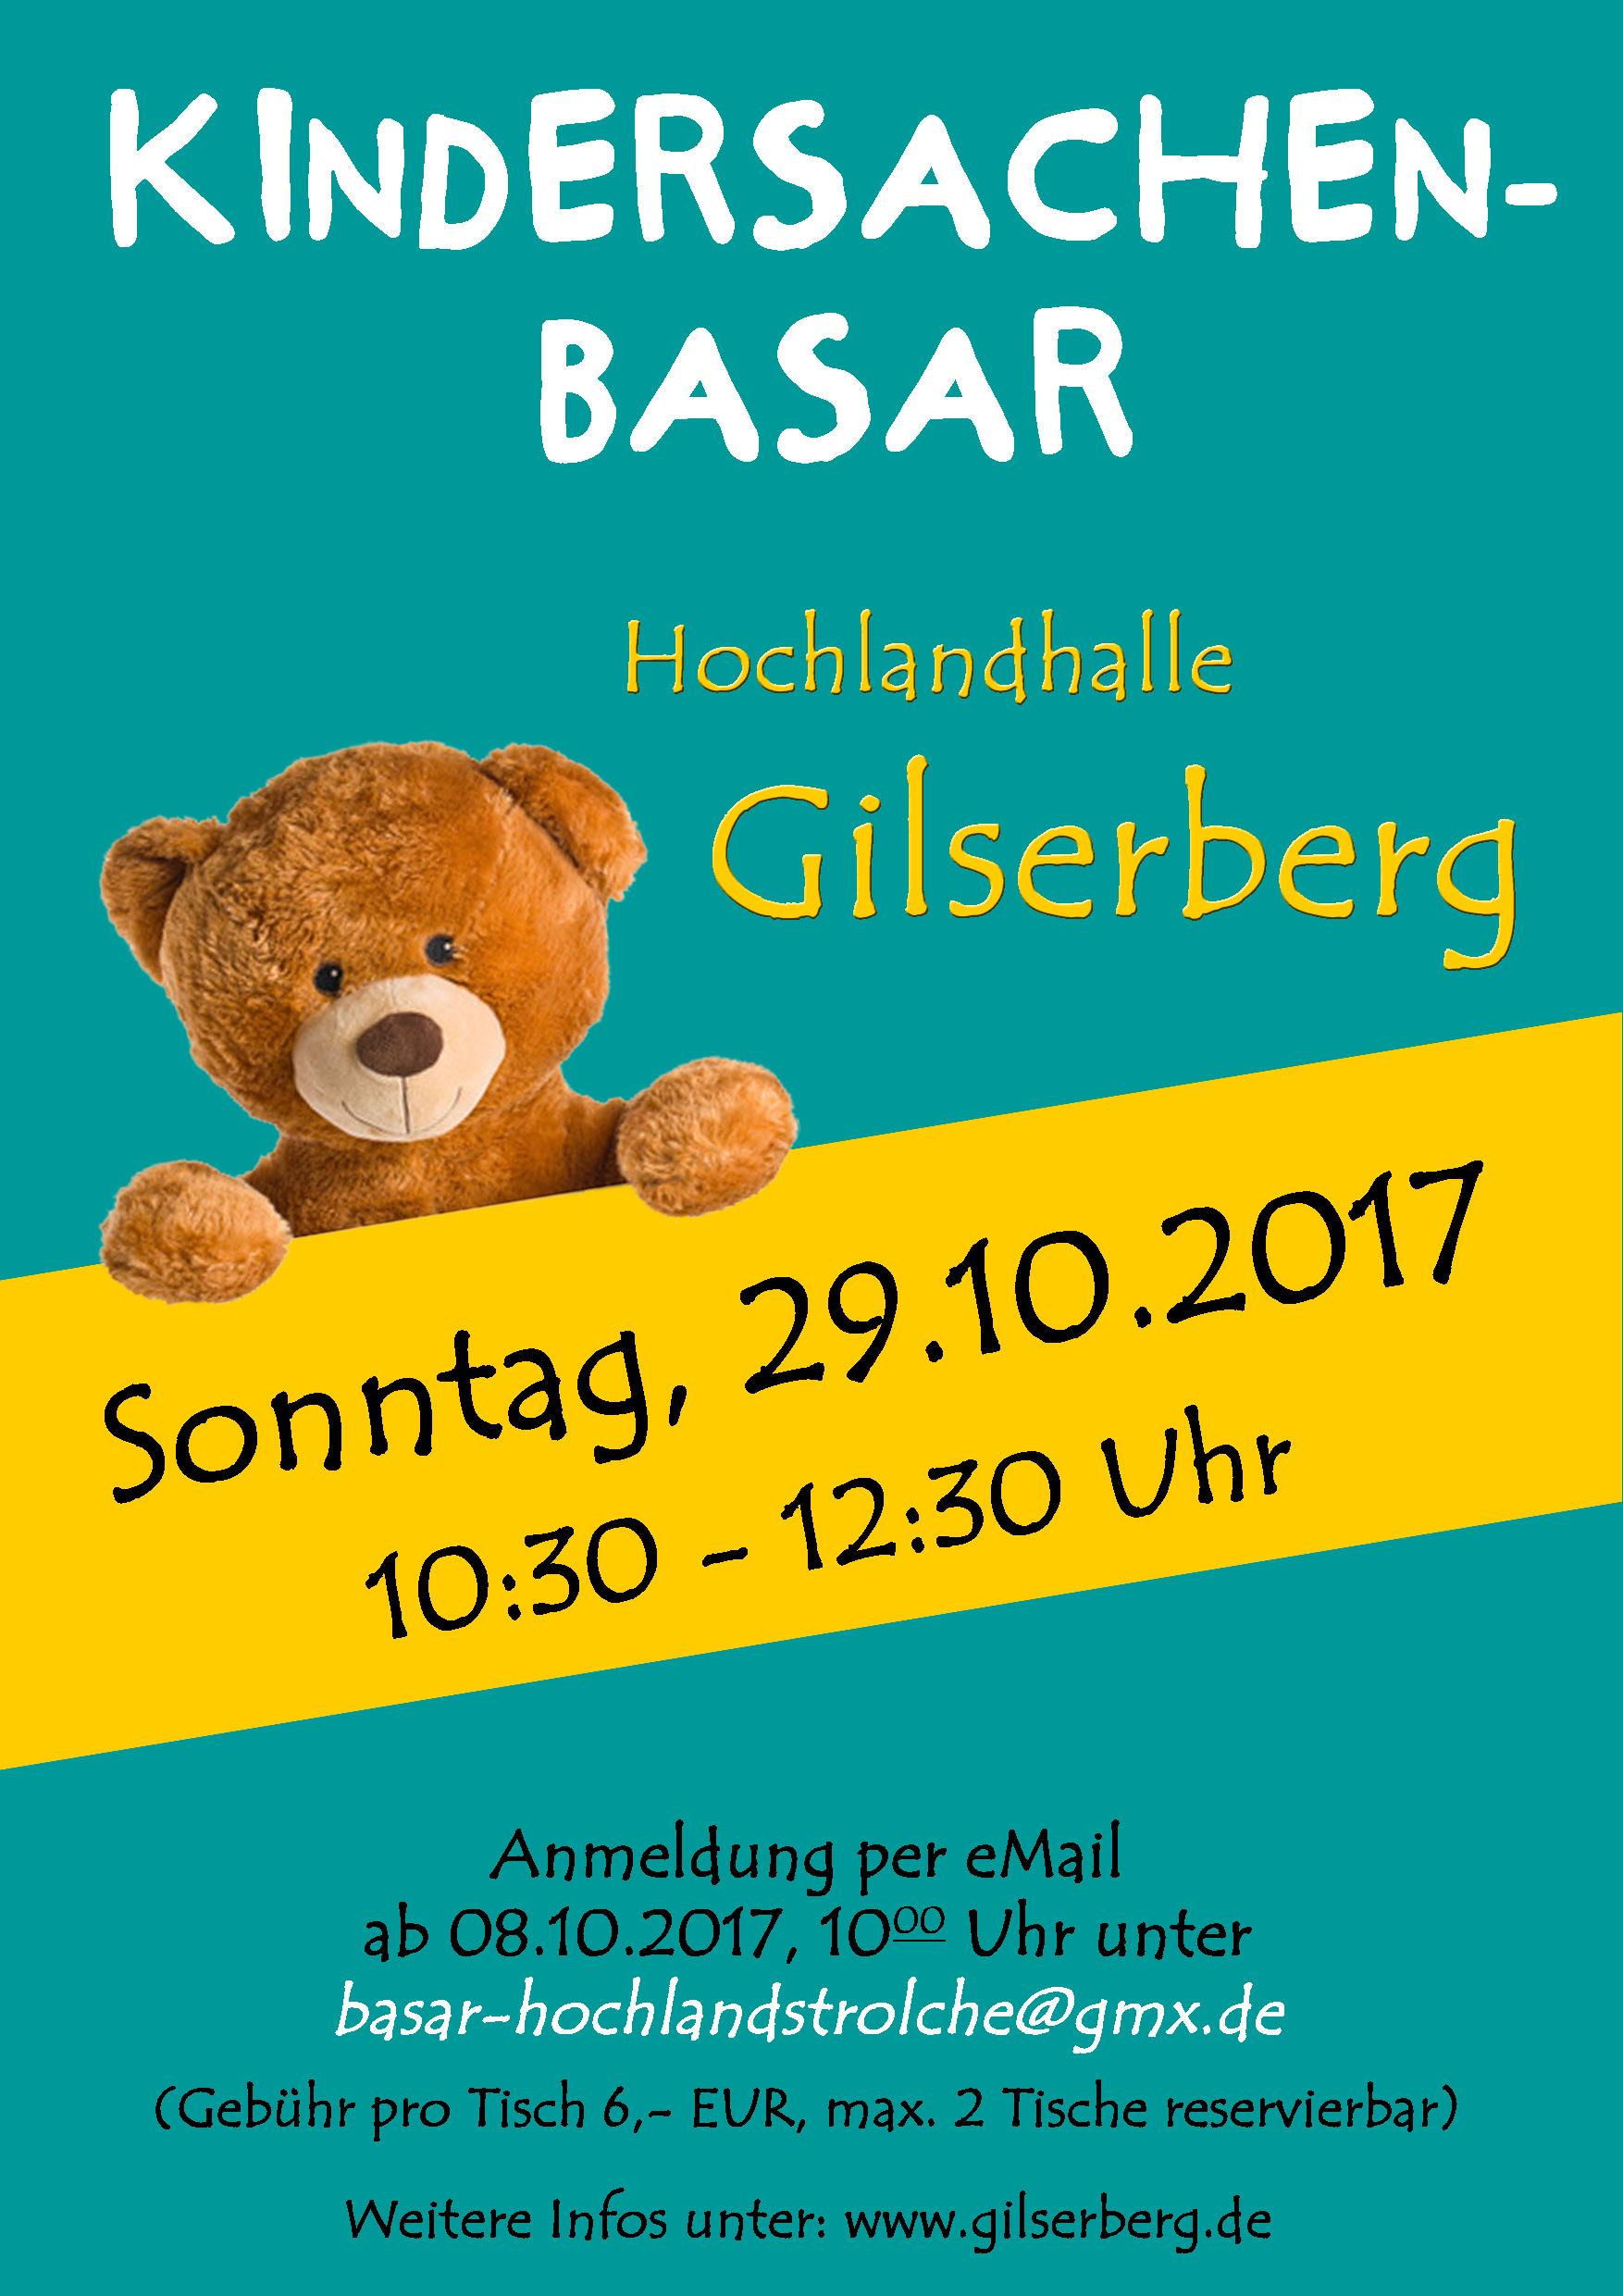 Kindersachenbasar 29.10.2017